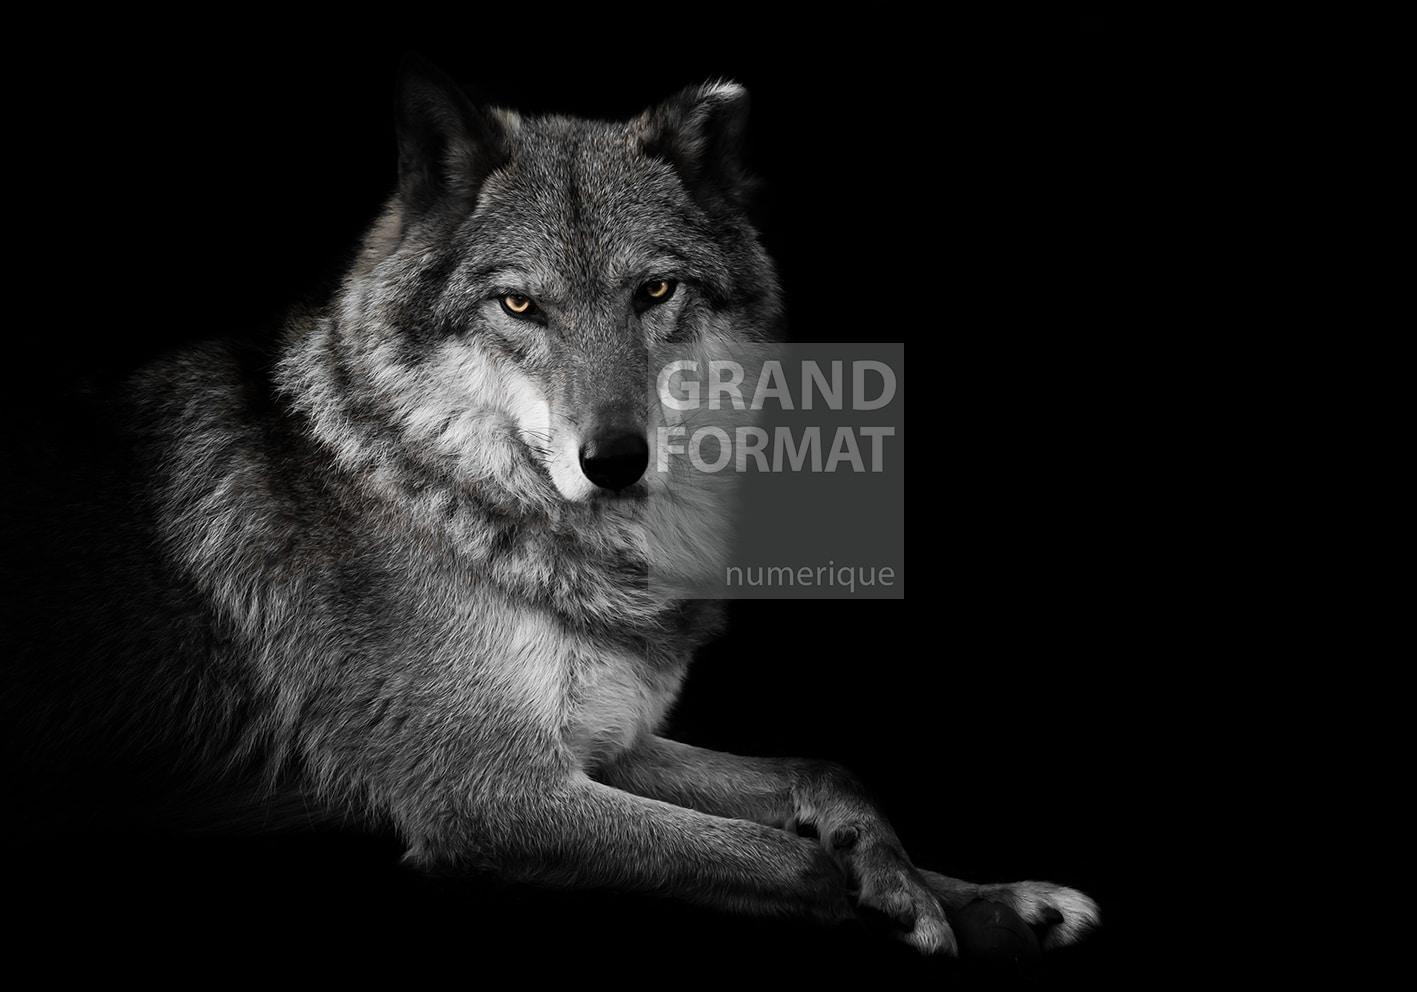 Loup animaux photo impression et toile